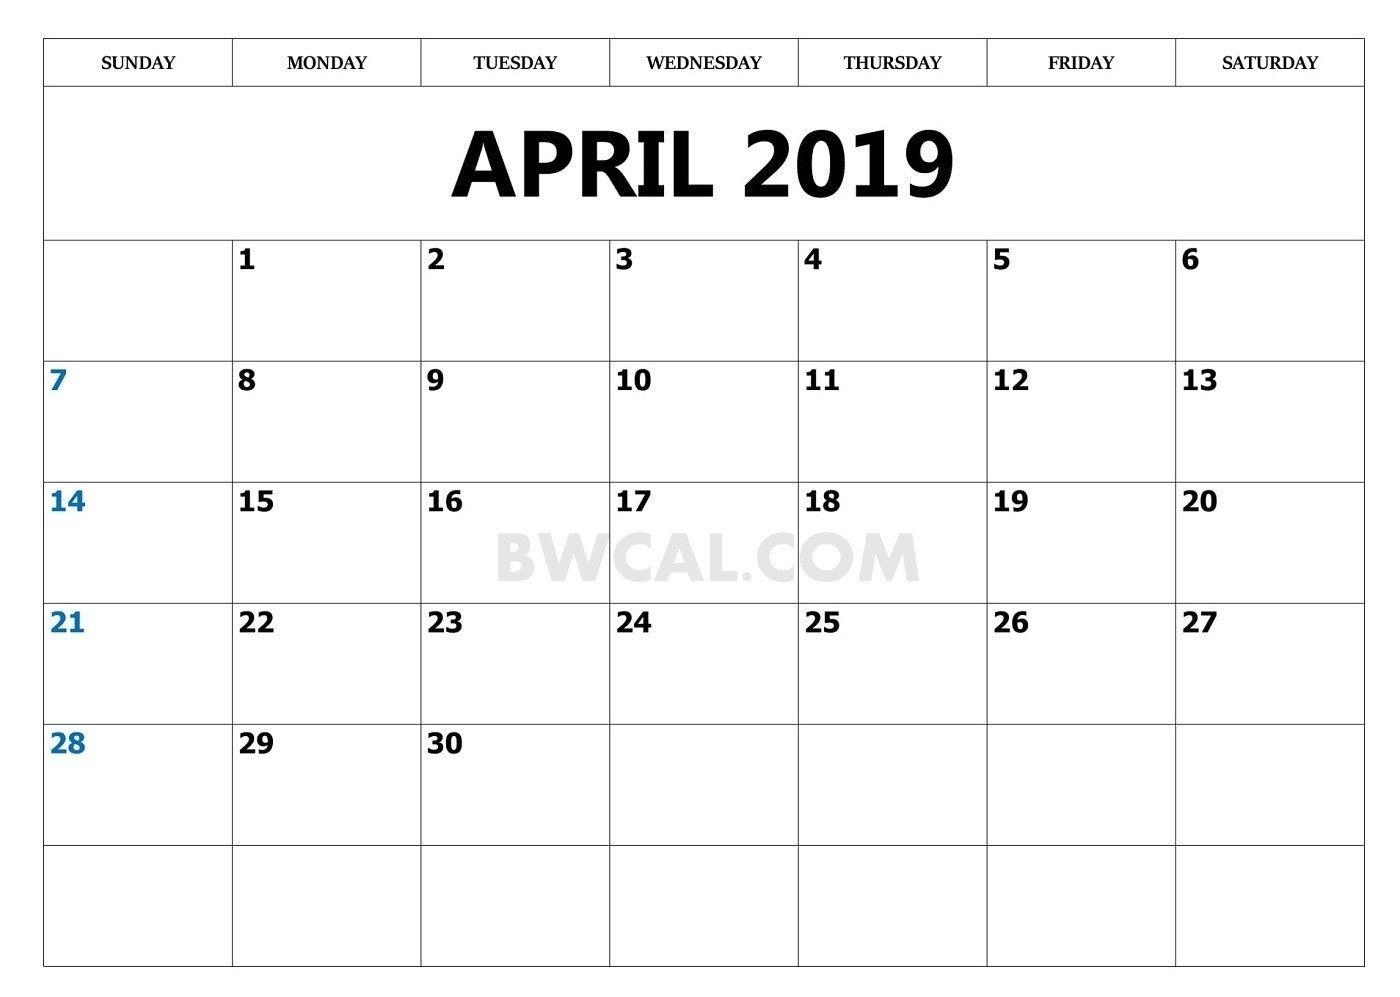 April 2019 Calendar With Holidays 2 Stln Jazz Gear Get Canada Calendar Moon Phase Calendar 2019 Calendar